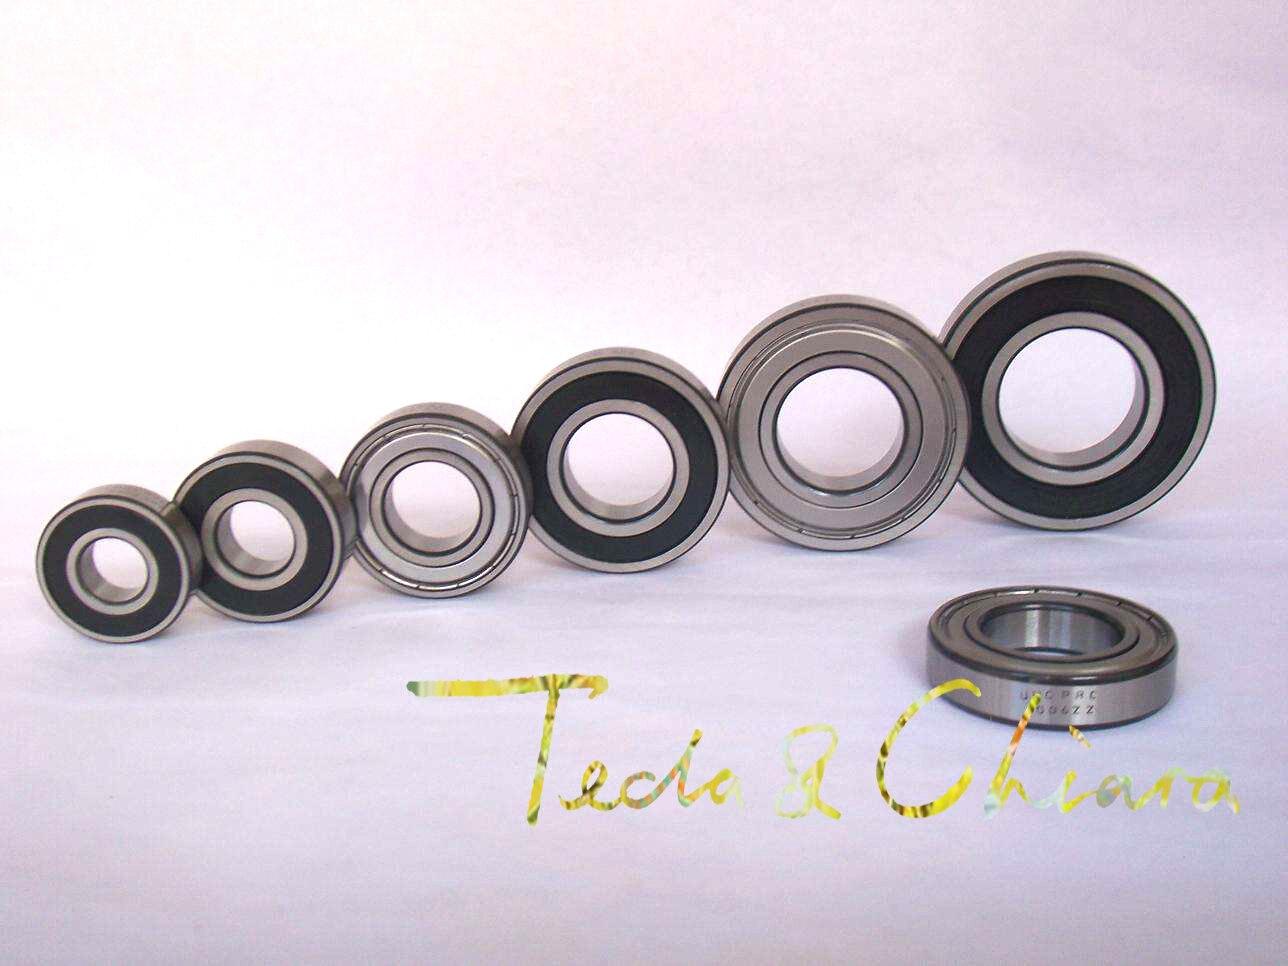 "R4 R4zz R4rs R4-2z R4z R4-2rs Zz Rs Rz 2rz Deep Groove Ball Bearings 6.35 X 15.875 X 4.98mm 1/4"" X 5/8"" X 0.196"" Online Discount"